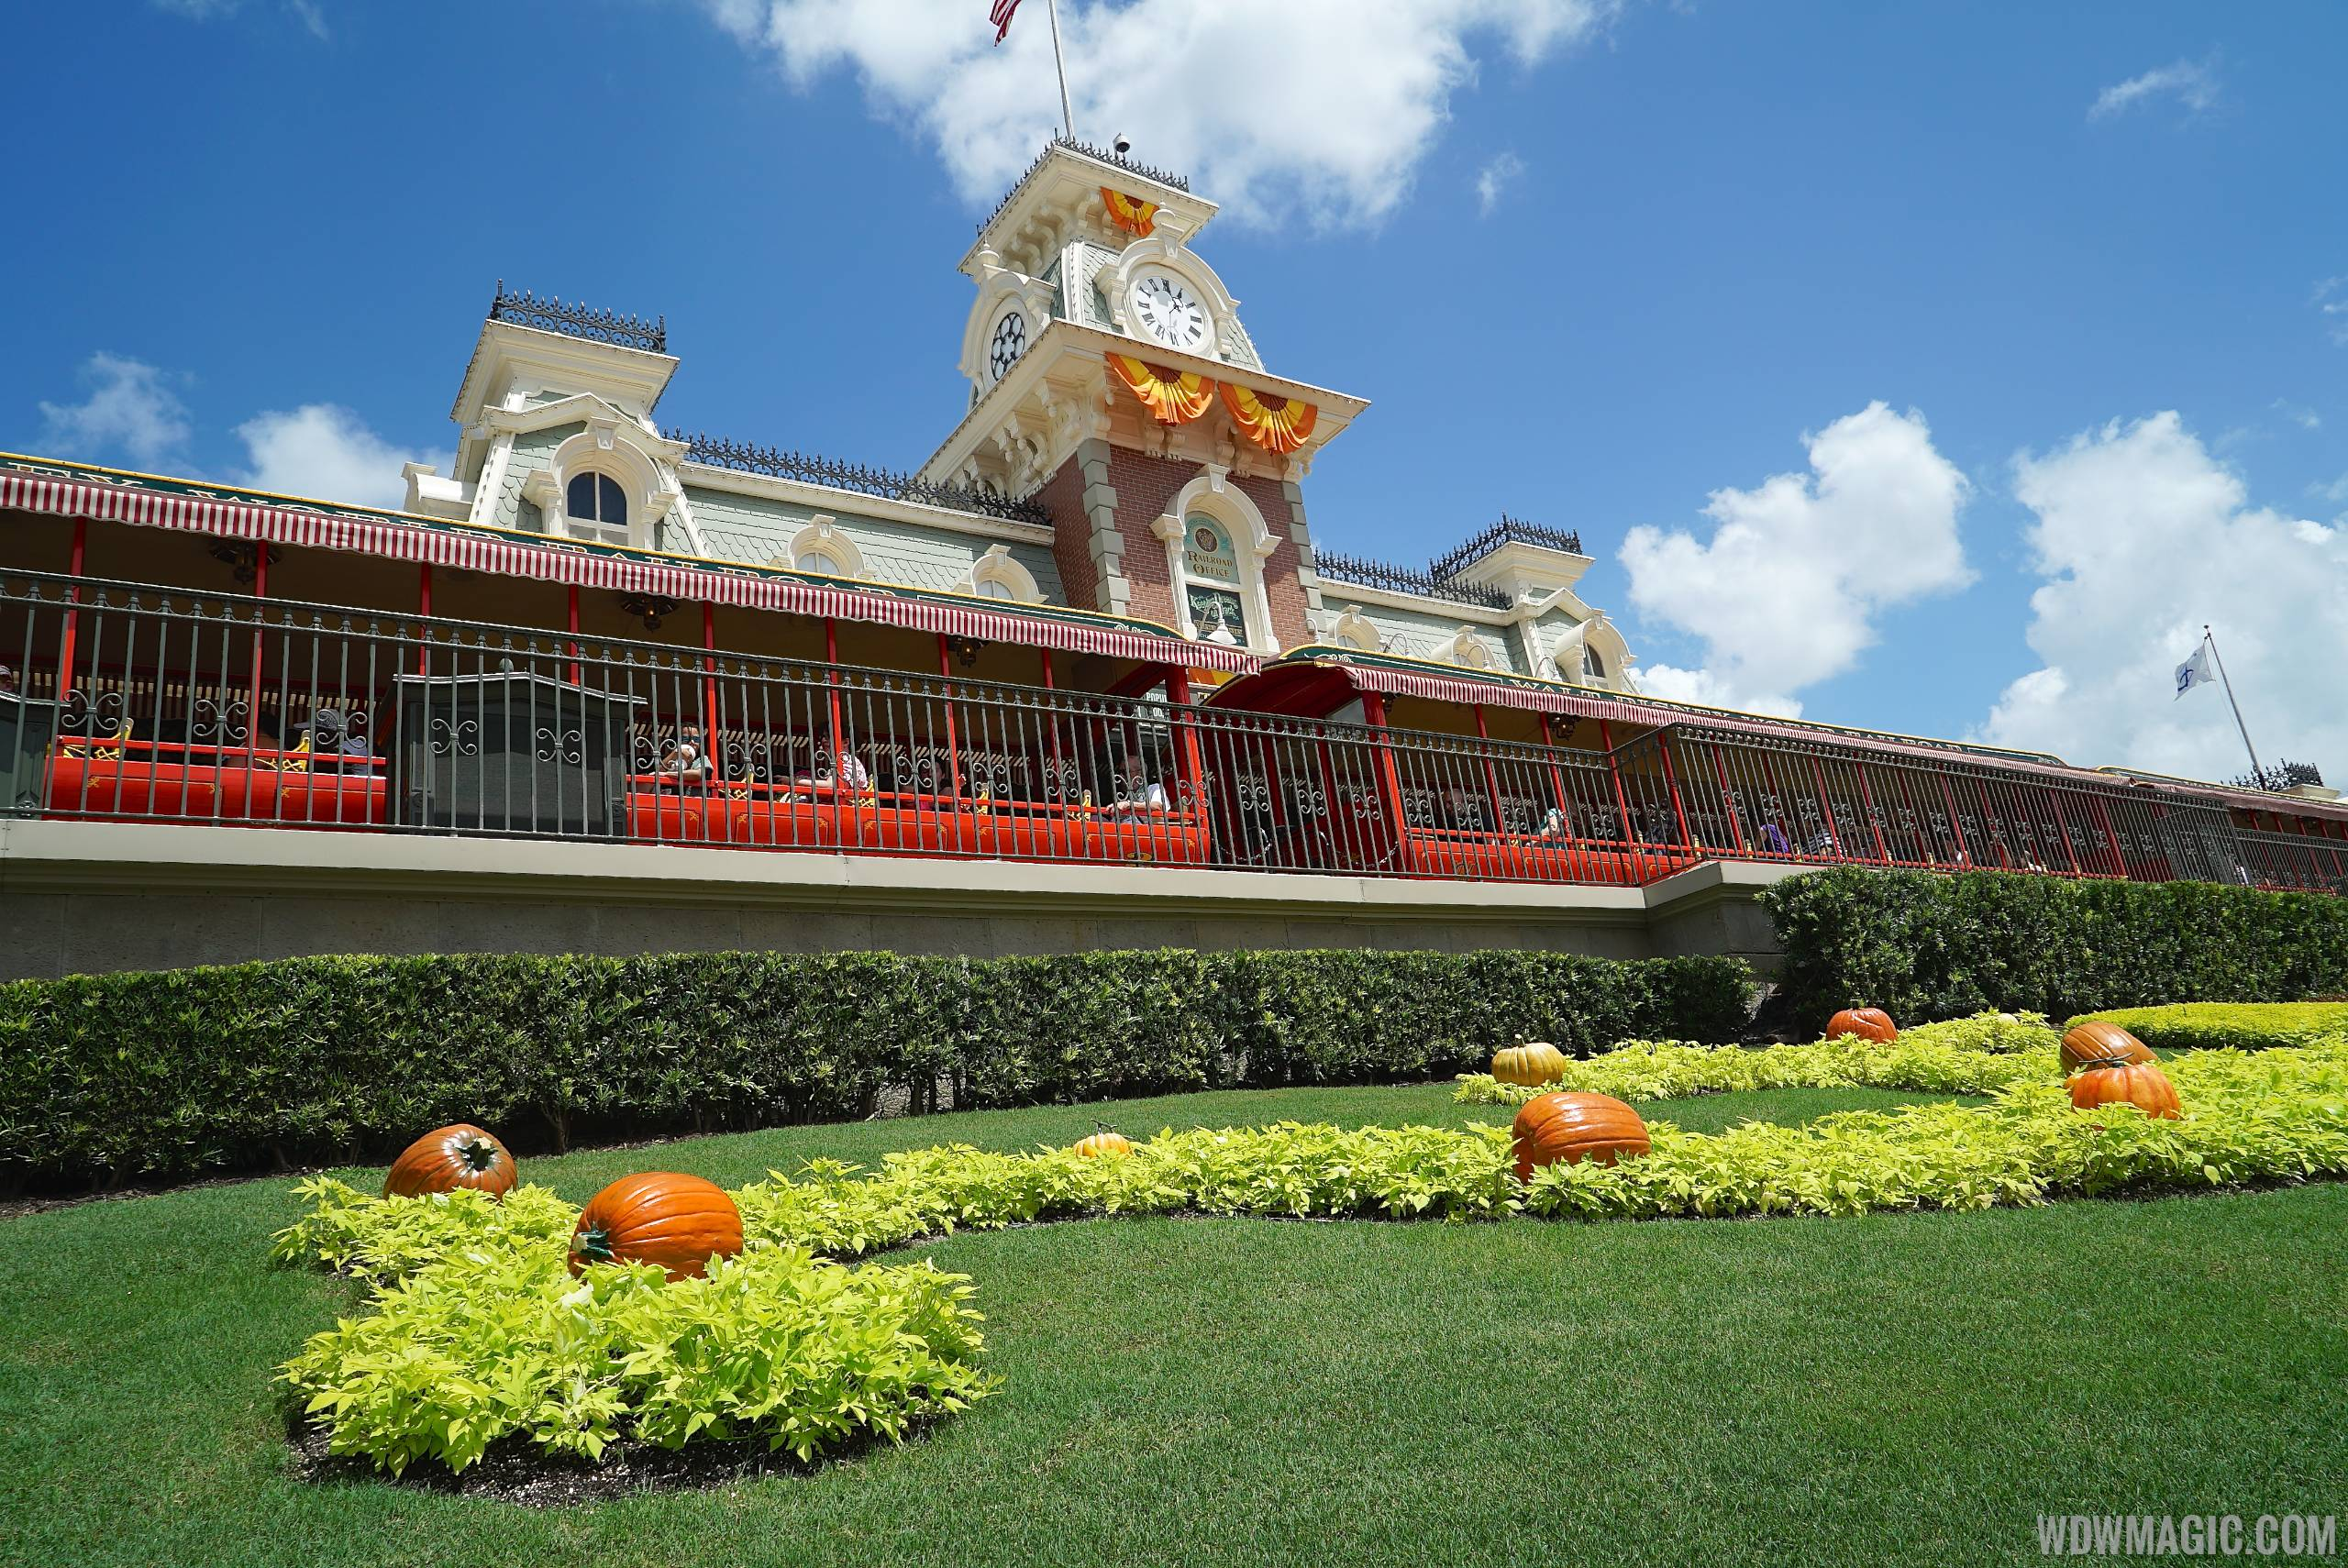 Mickey's Not-So-Scary Halloween Party News